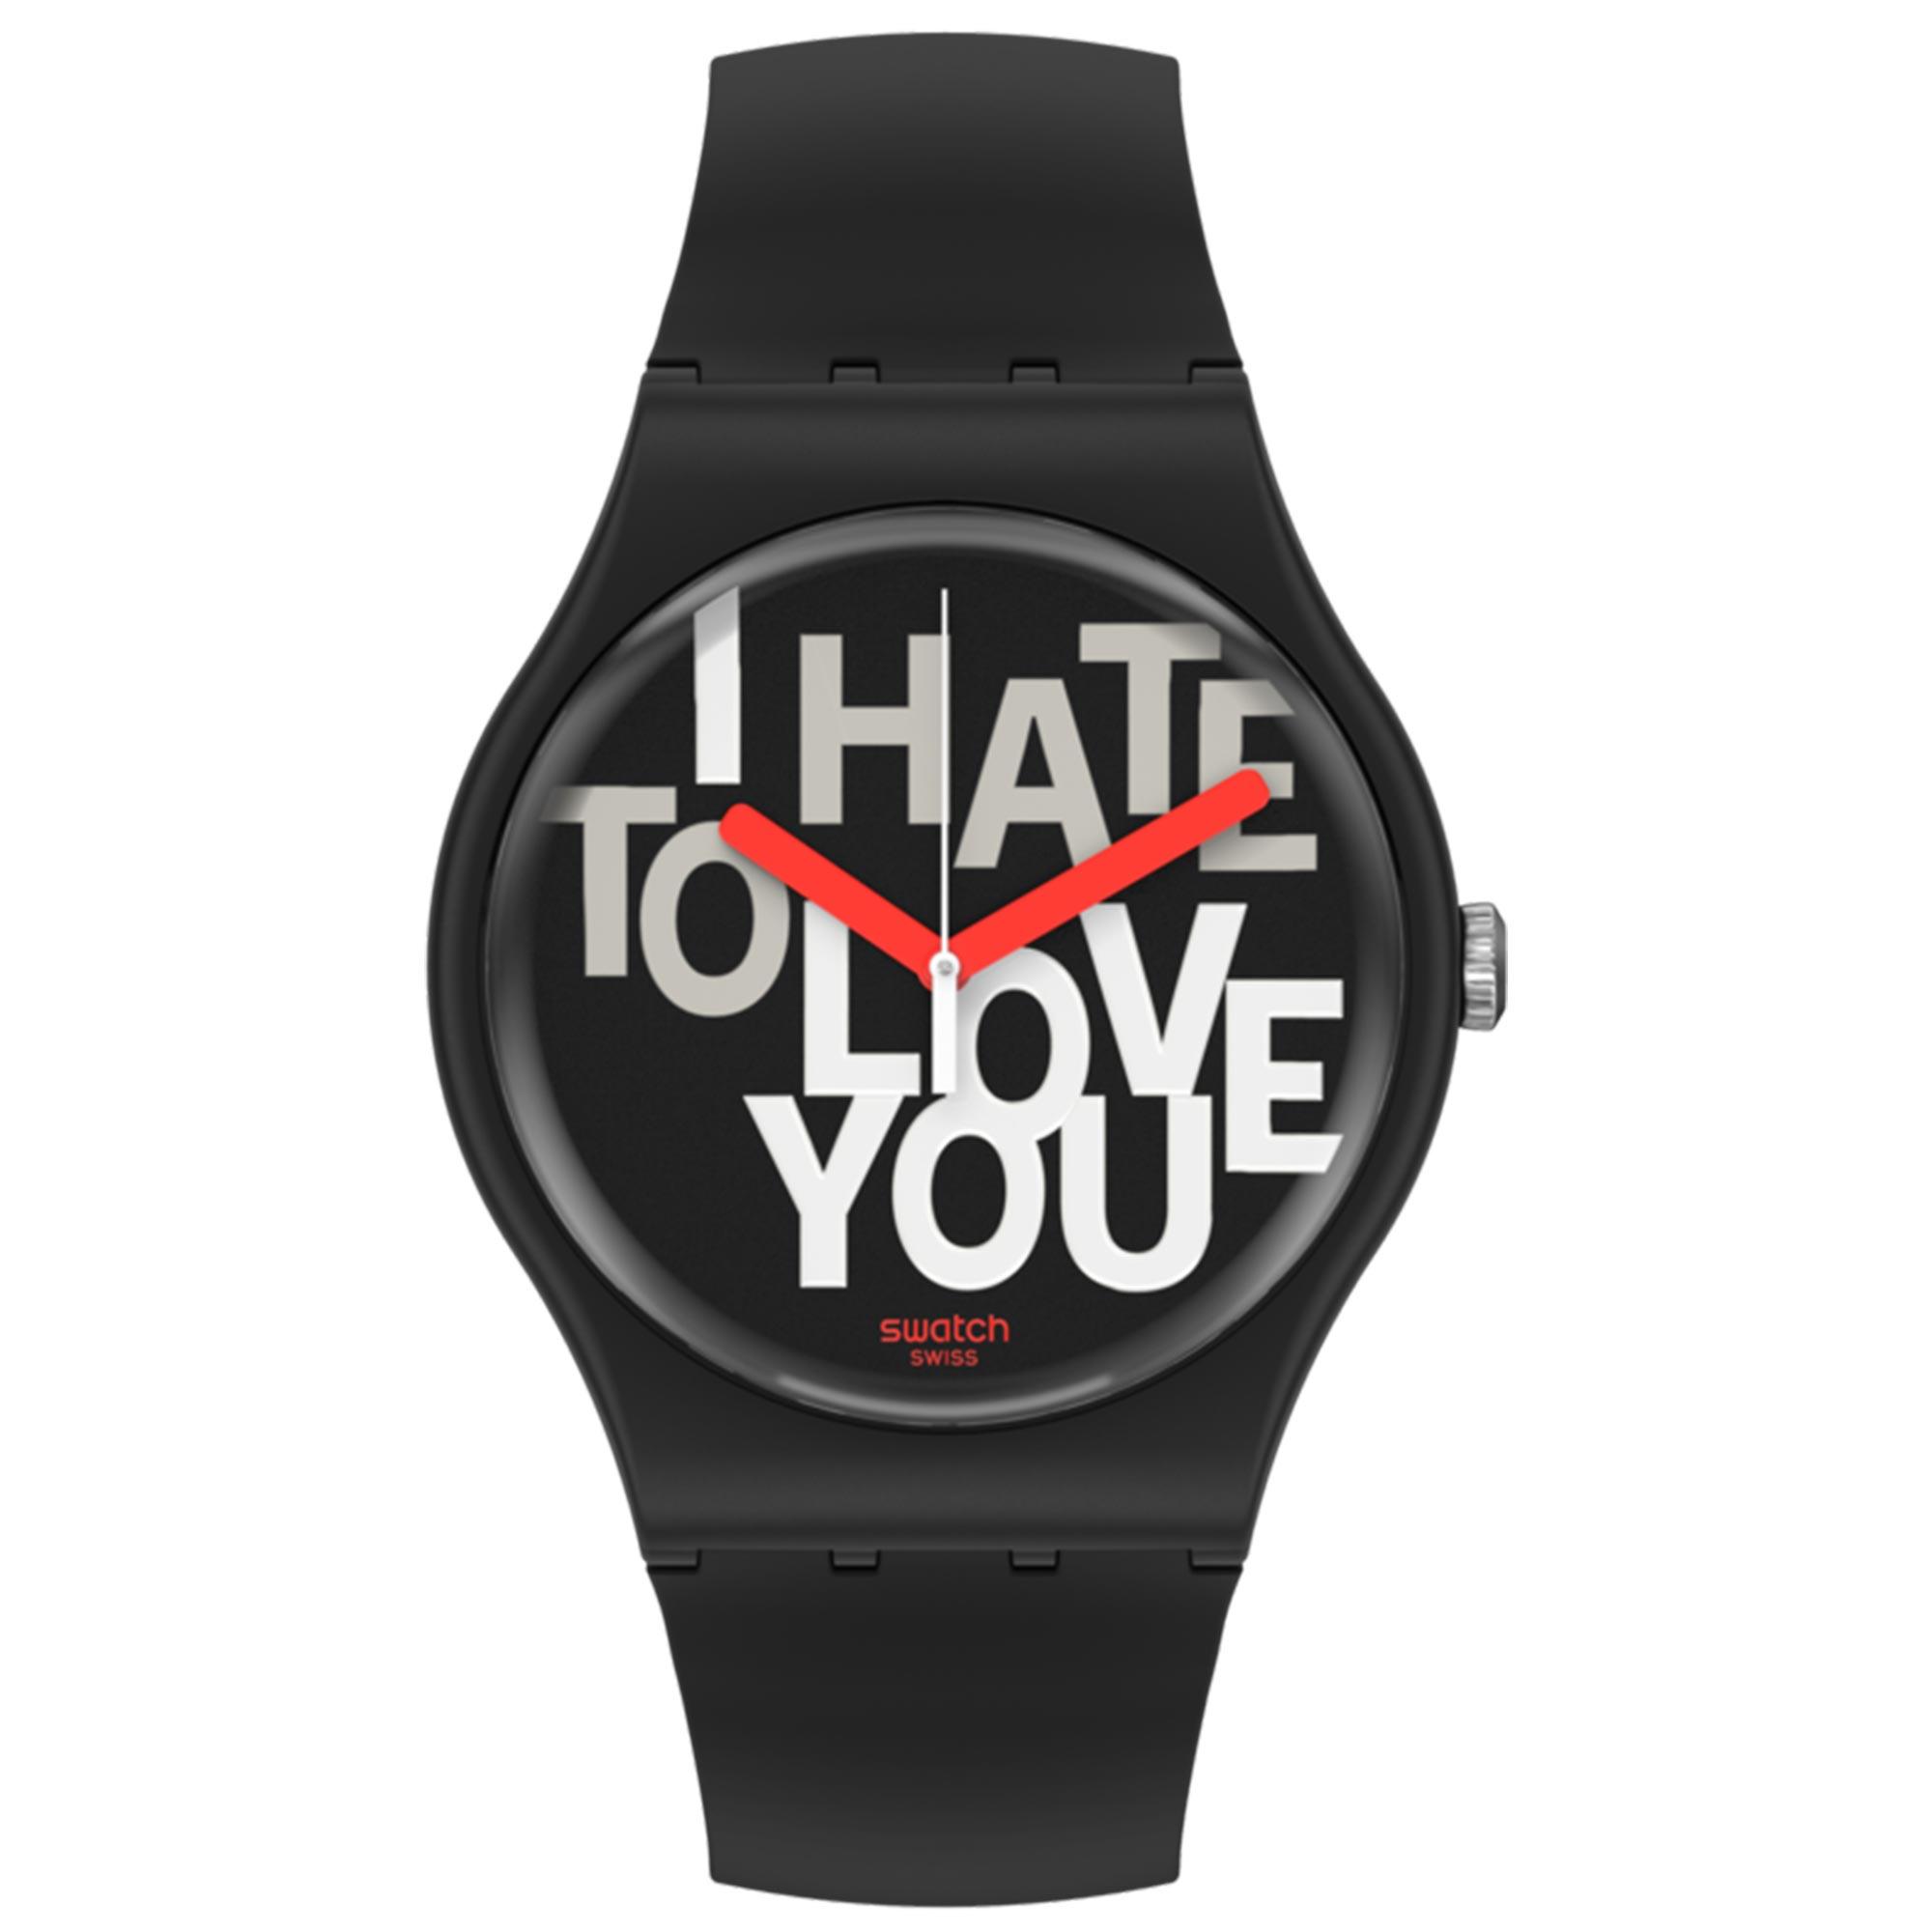 Swatch Hate 2 Love Quartz Black Dial Silicone Strap Watch SUOB185